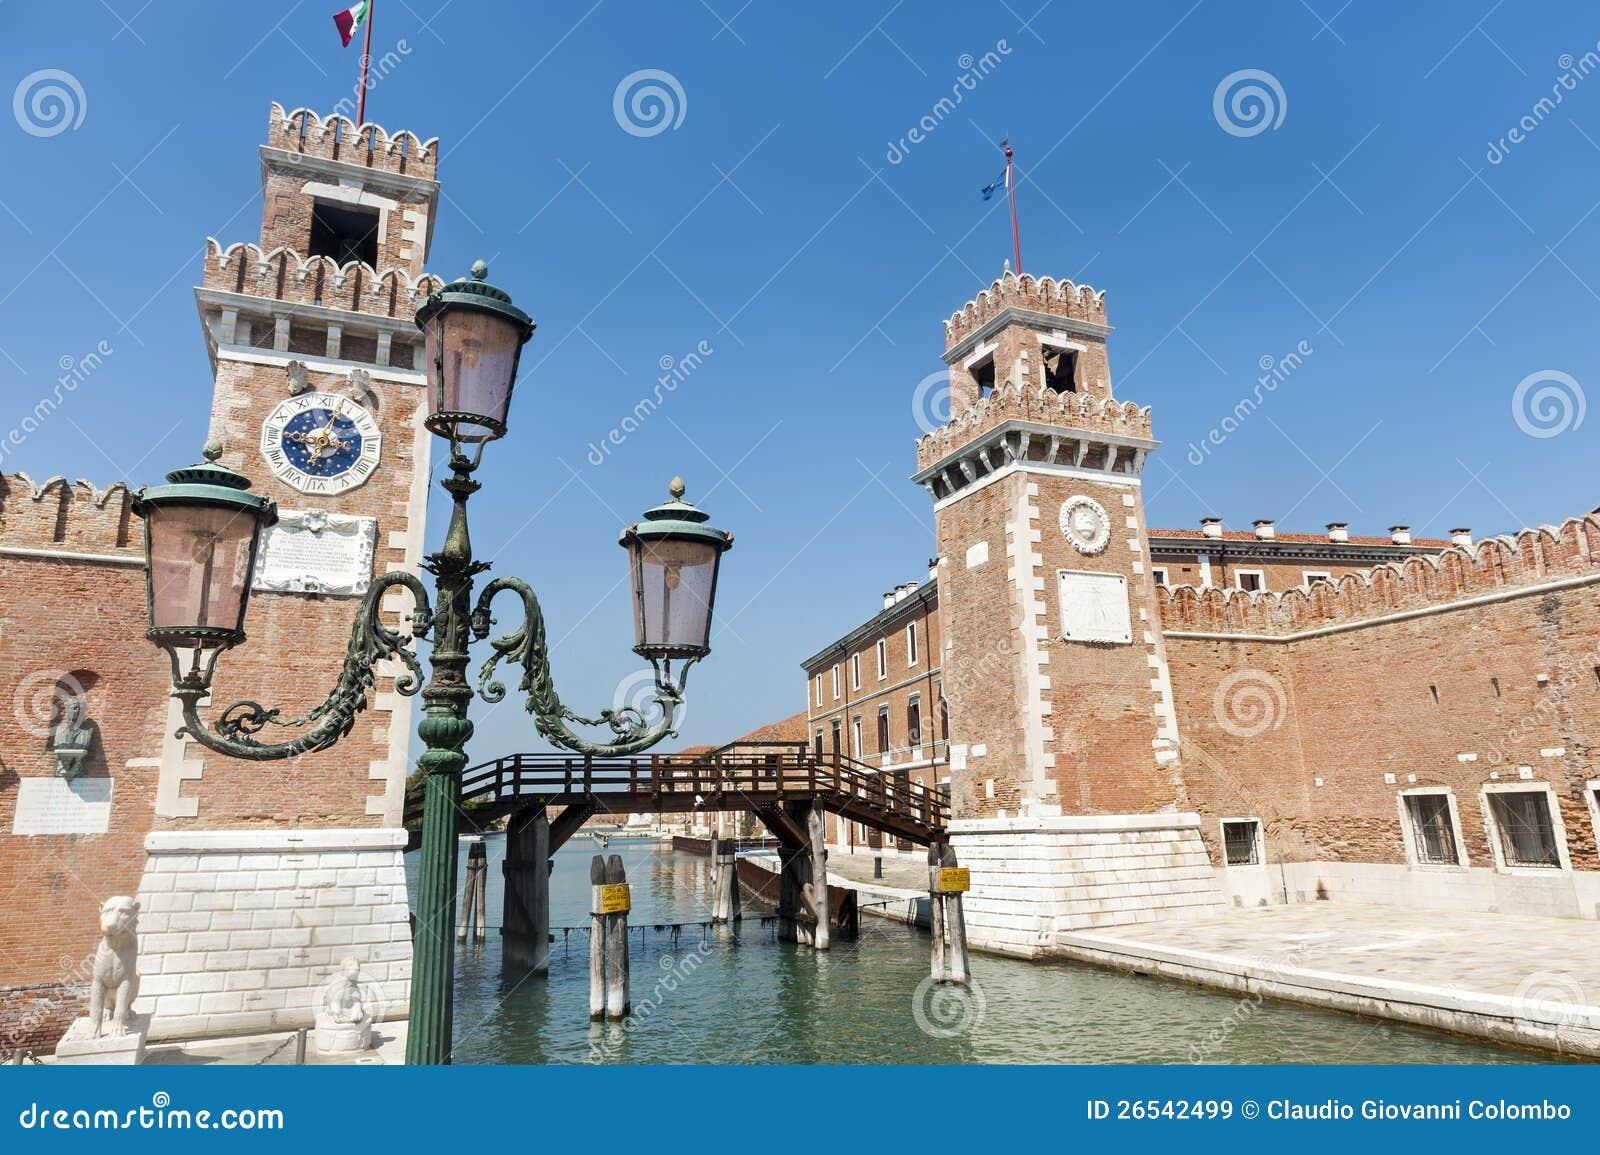 Venice, the arsenal